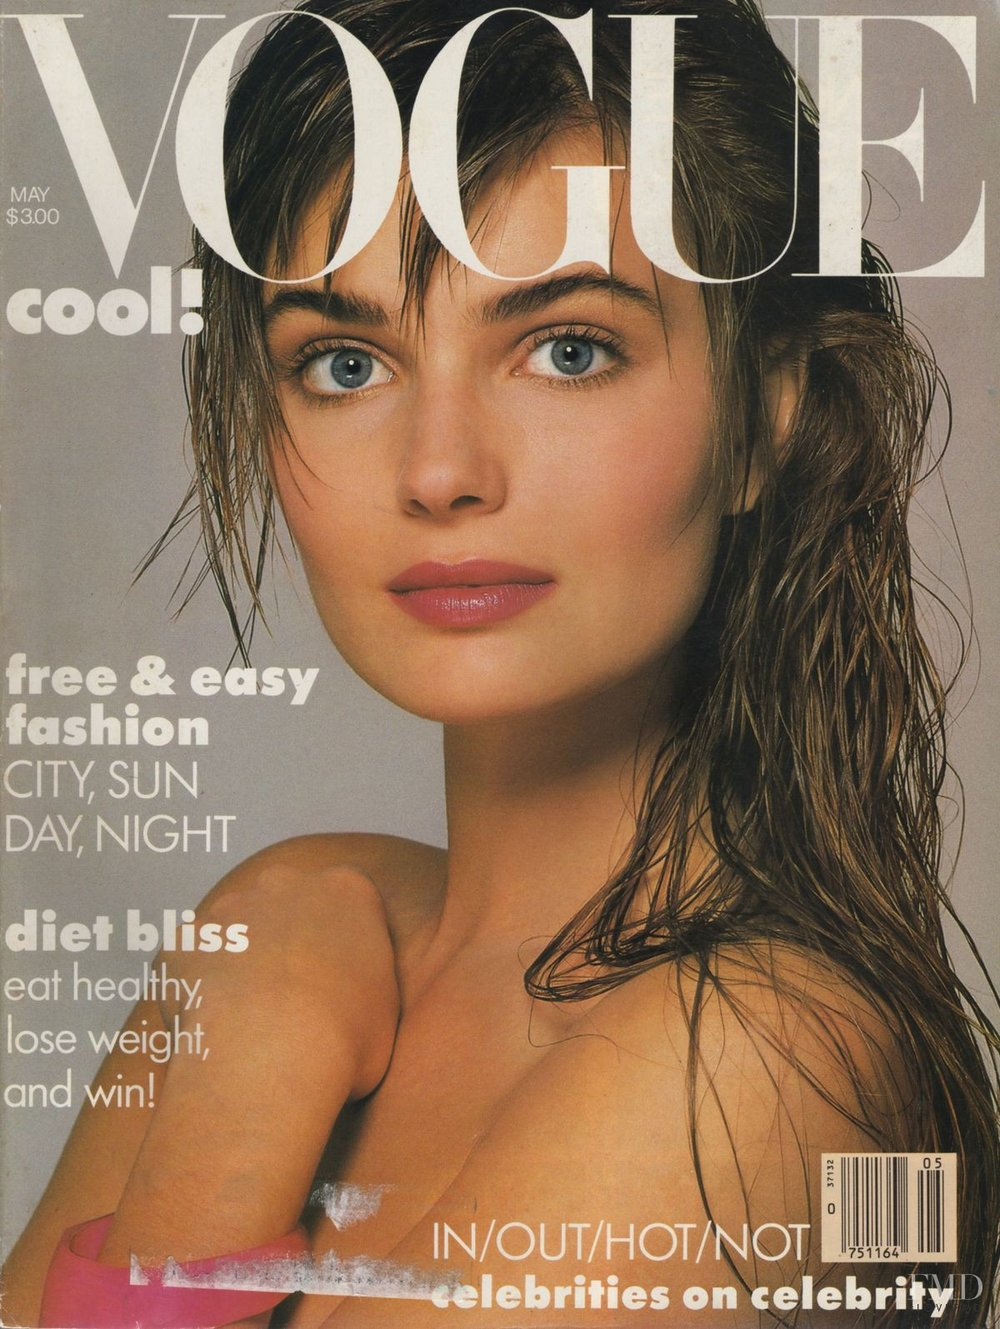 vogue-usa-1986-may-00-fullsize.jpg